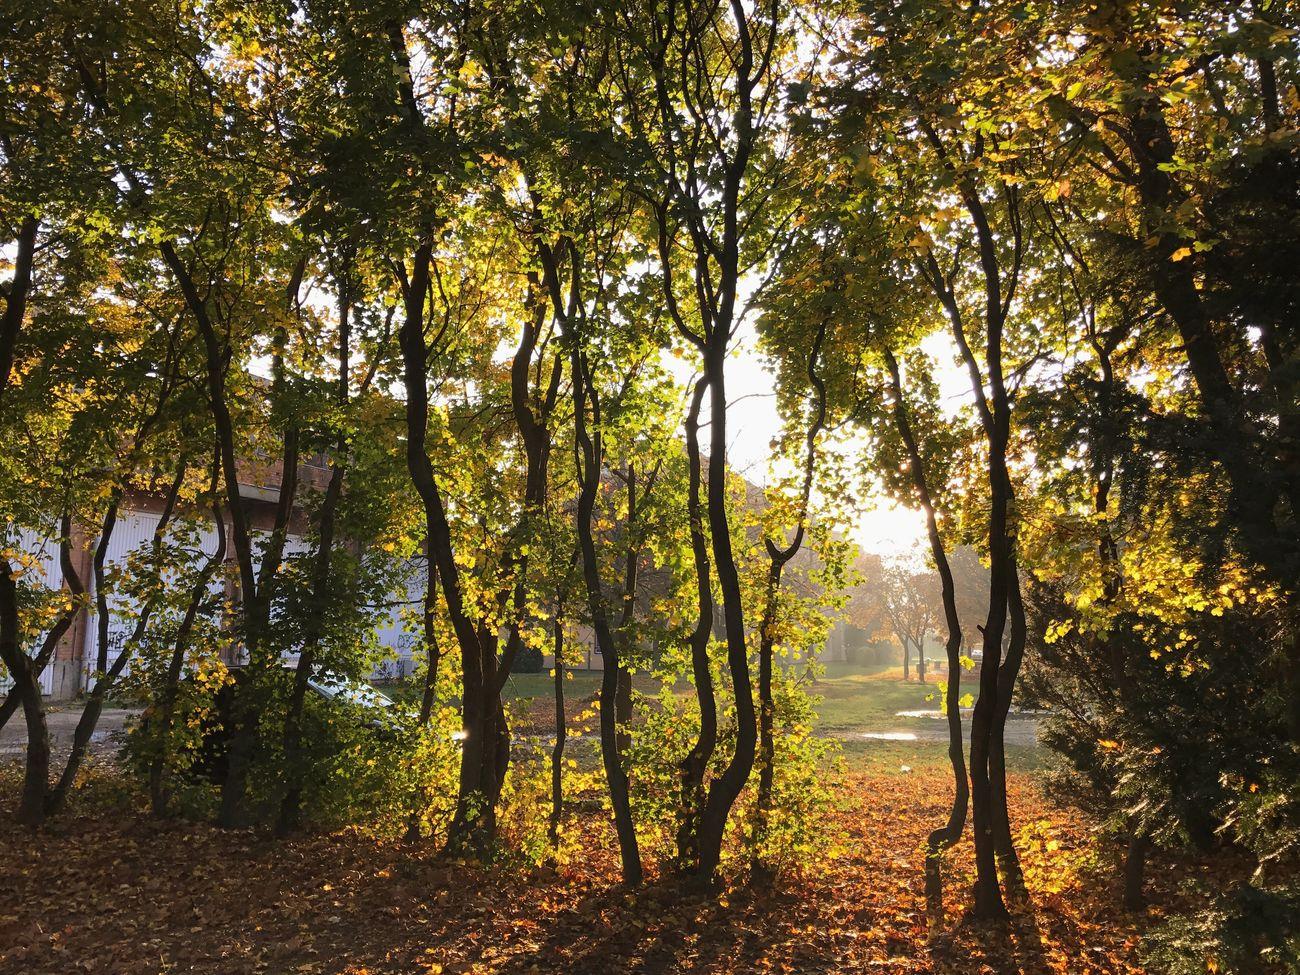 Autumn Autumn Colors Nature Tree Day Letters Hungary Szombathely